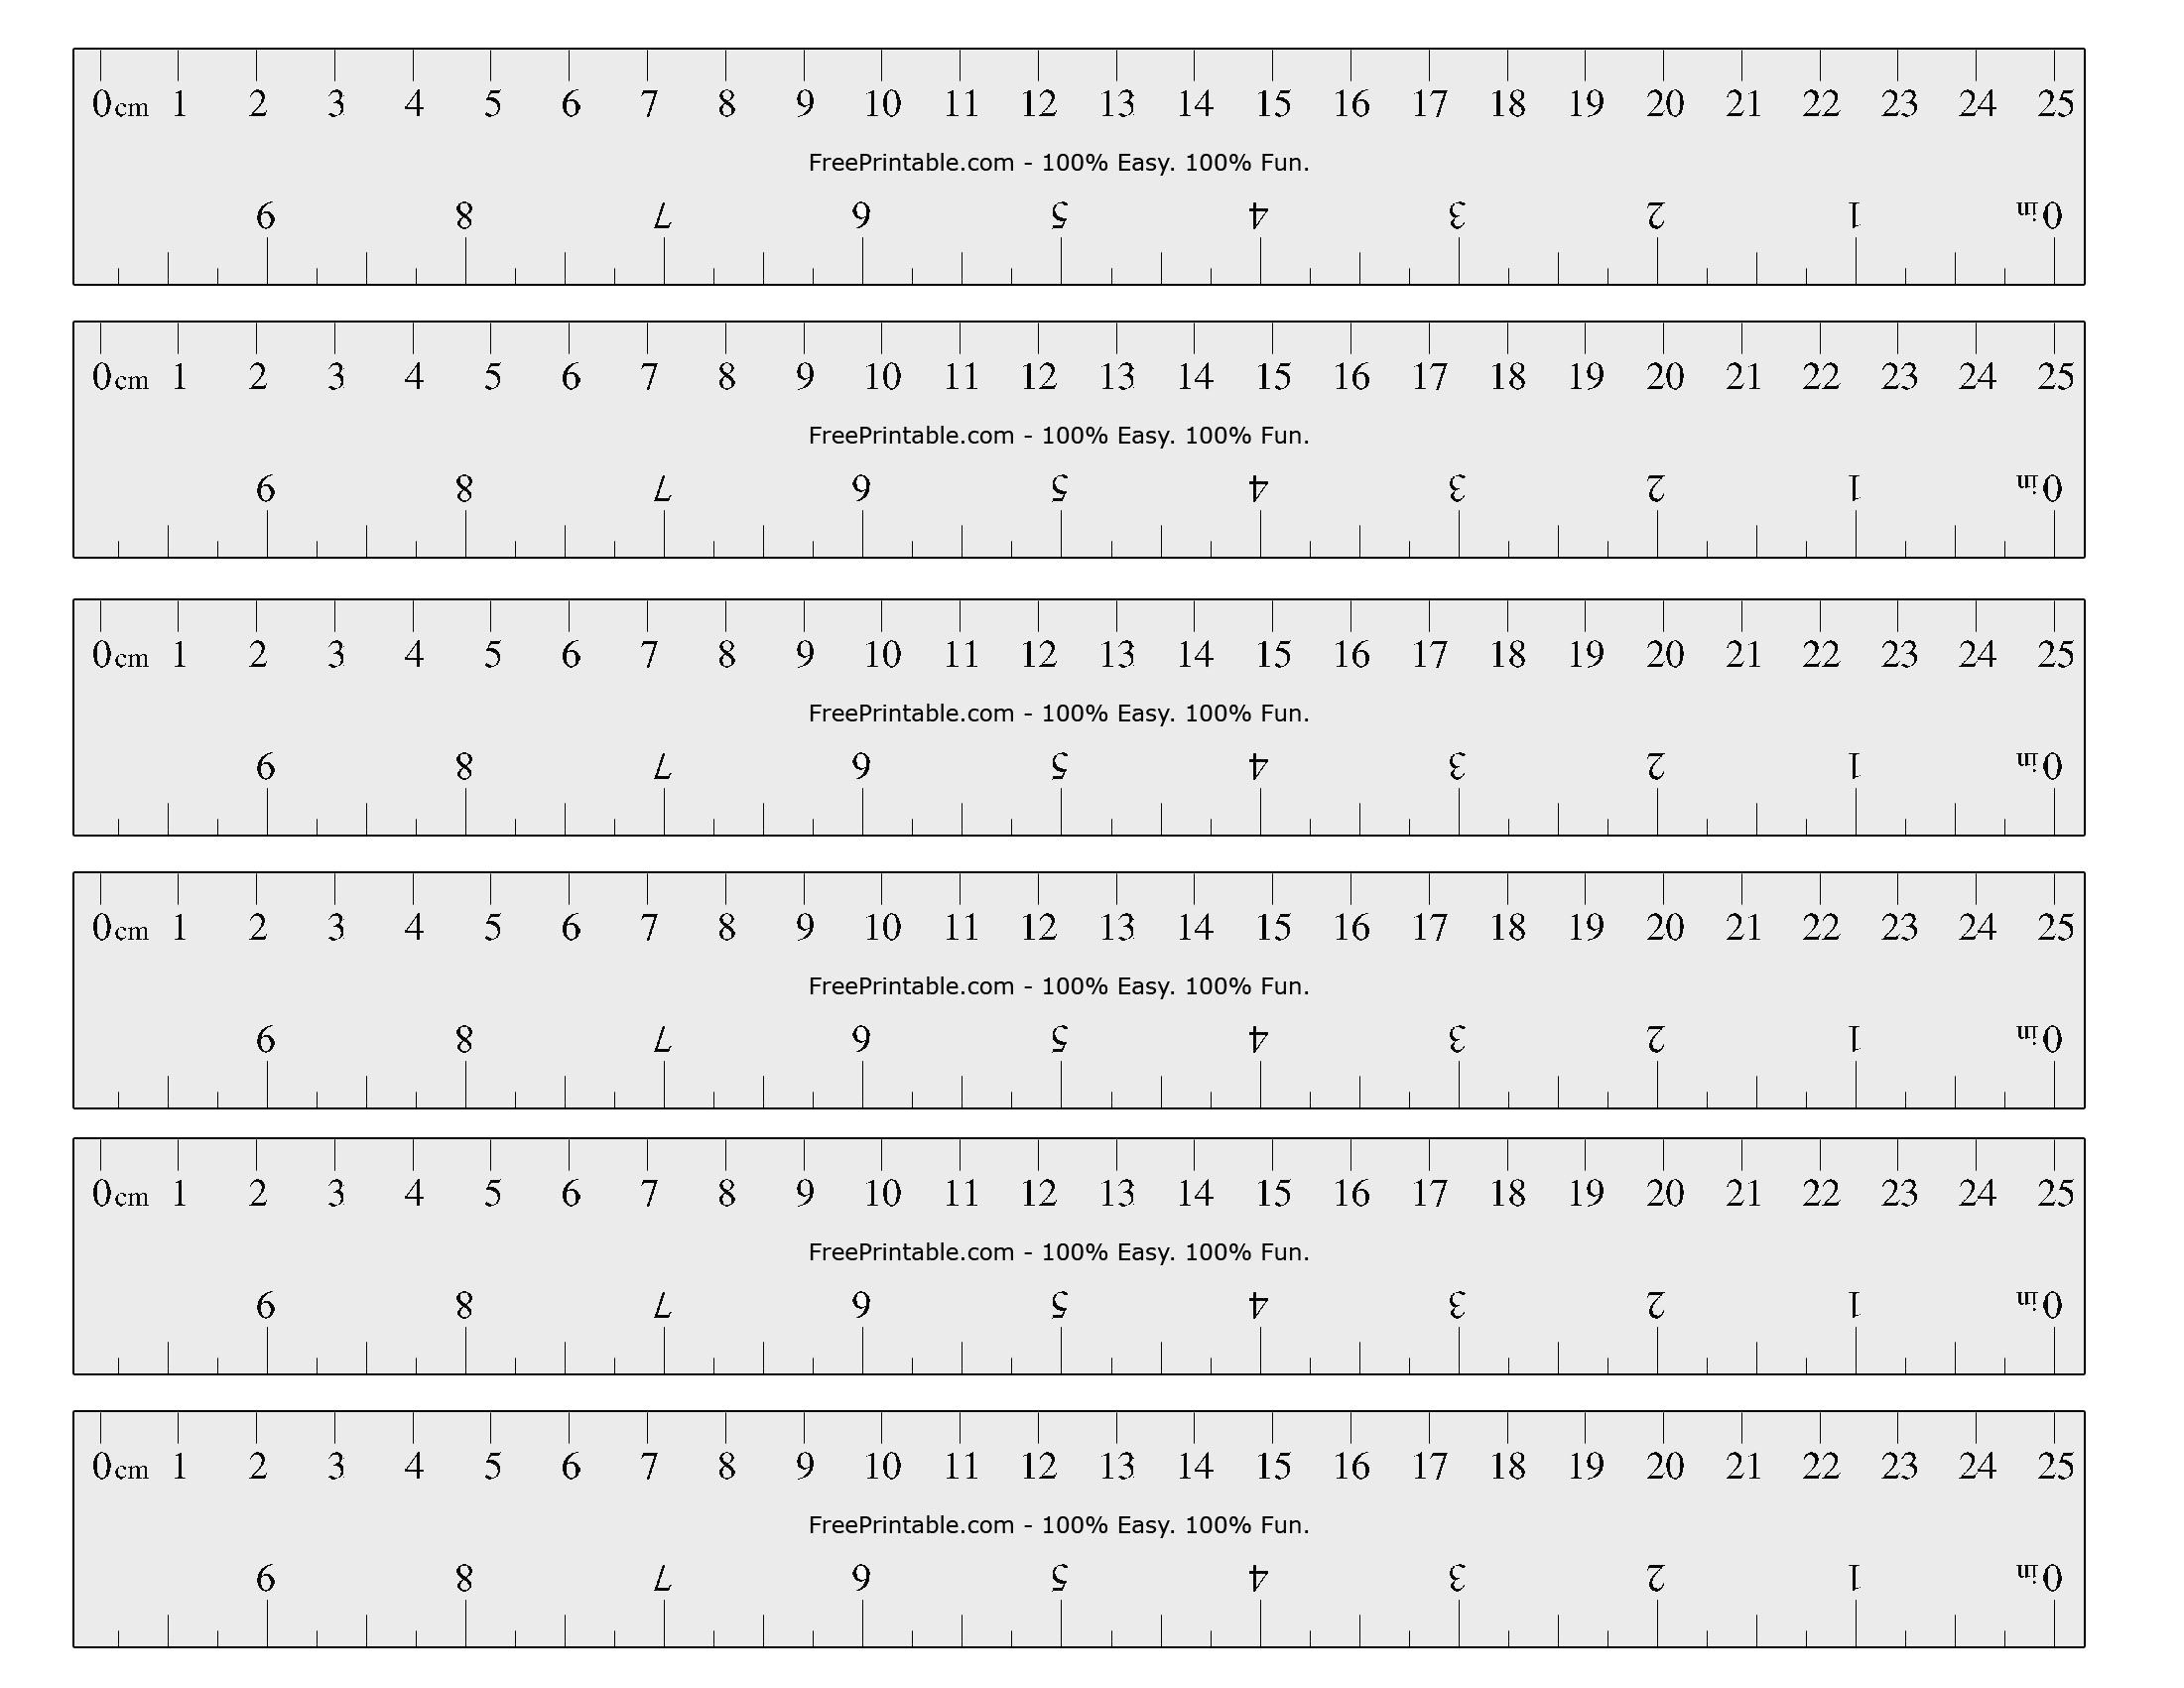 Free Printable Cm/inch Ruler | Math Mania!! | Printable Ruler, Free - Free Printable Ruler